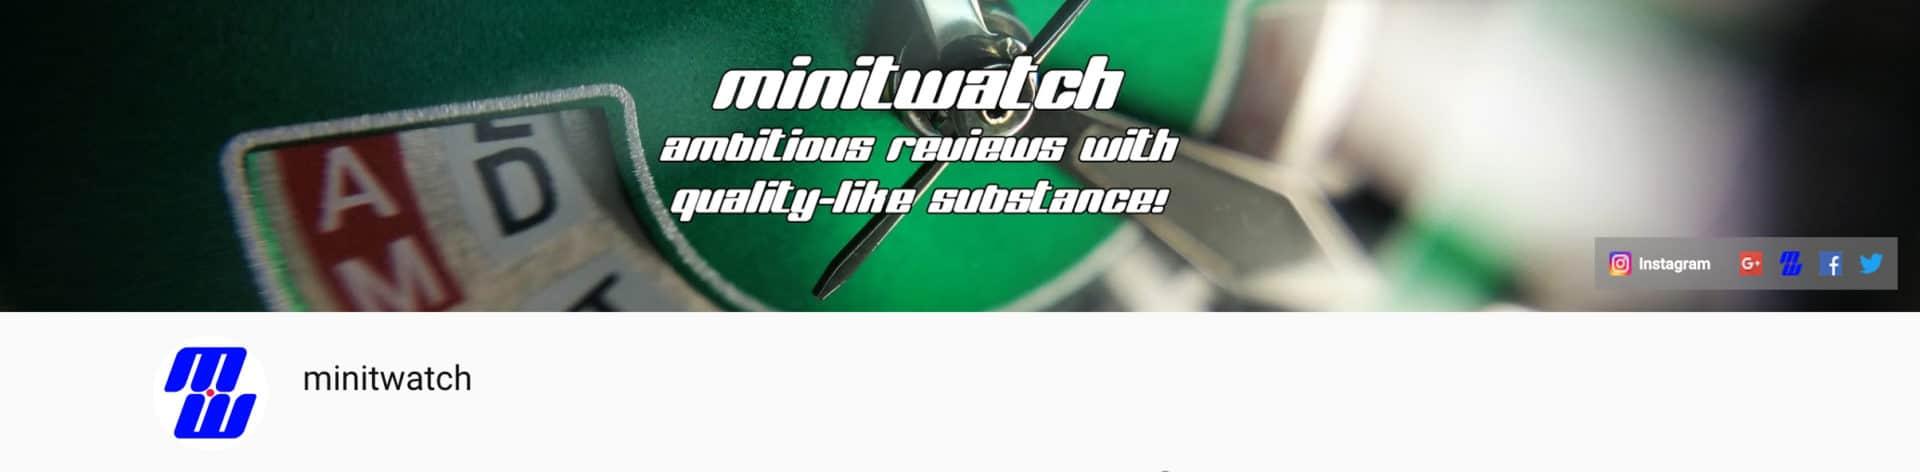 yt minitwatch